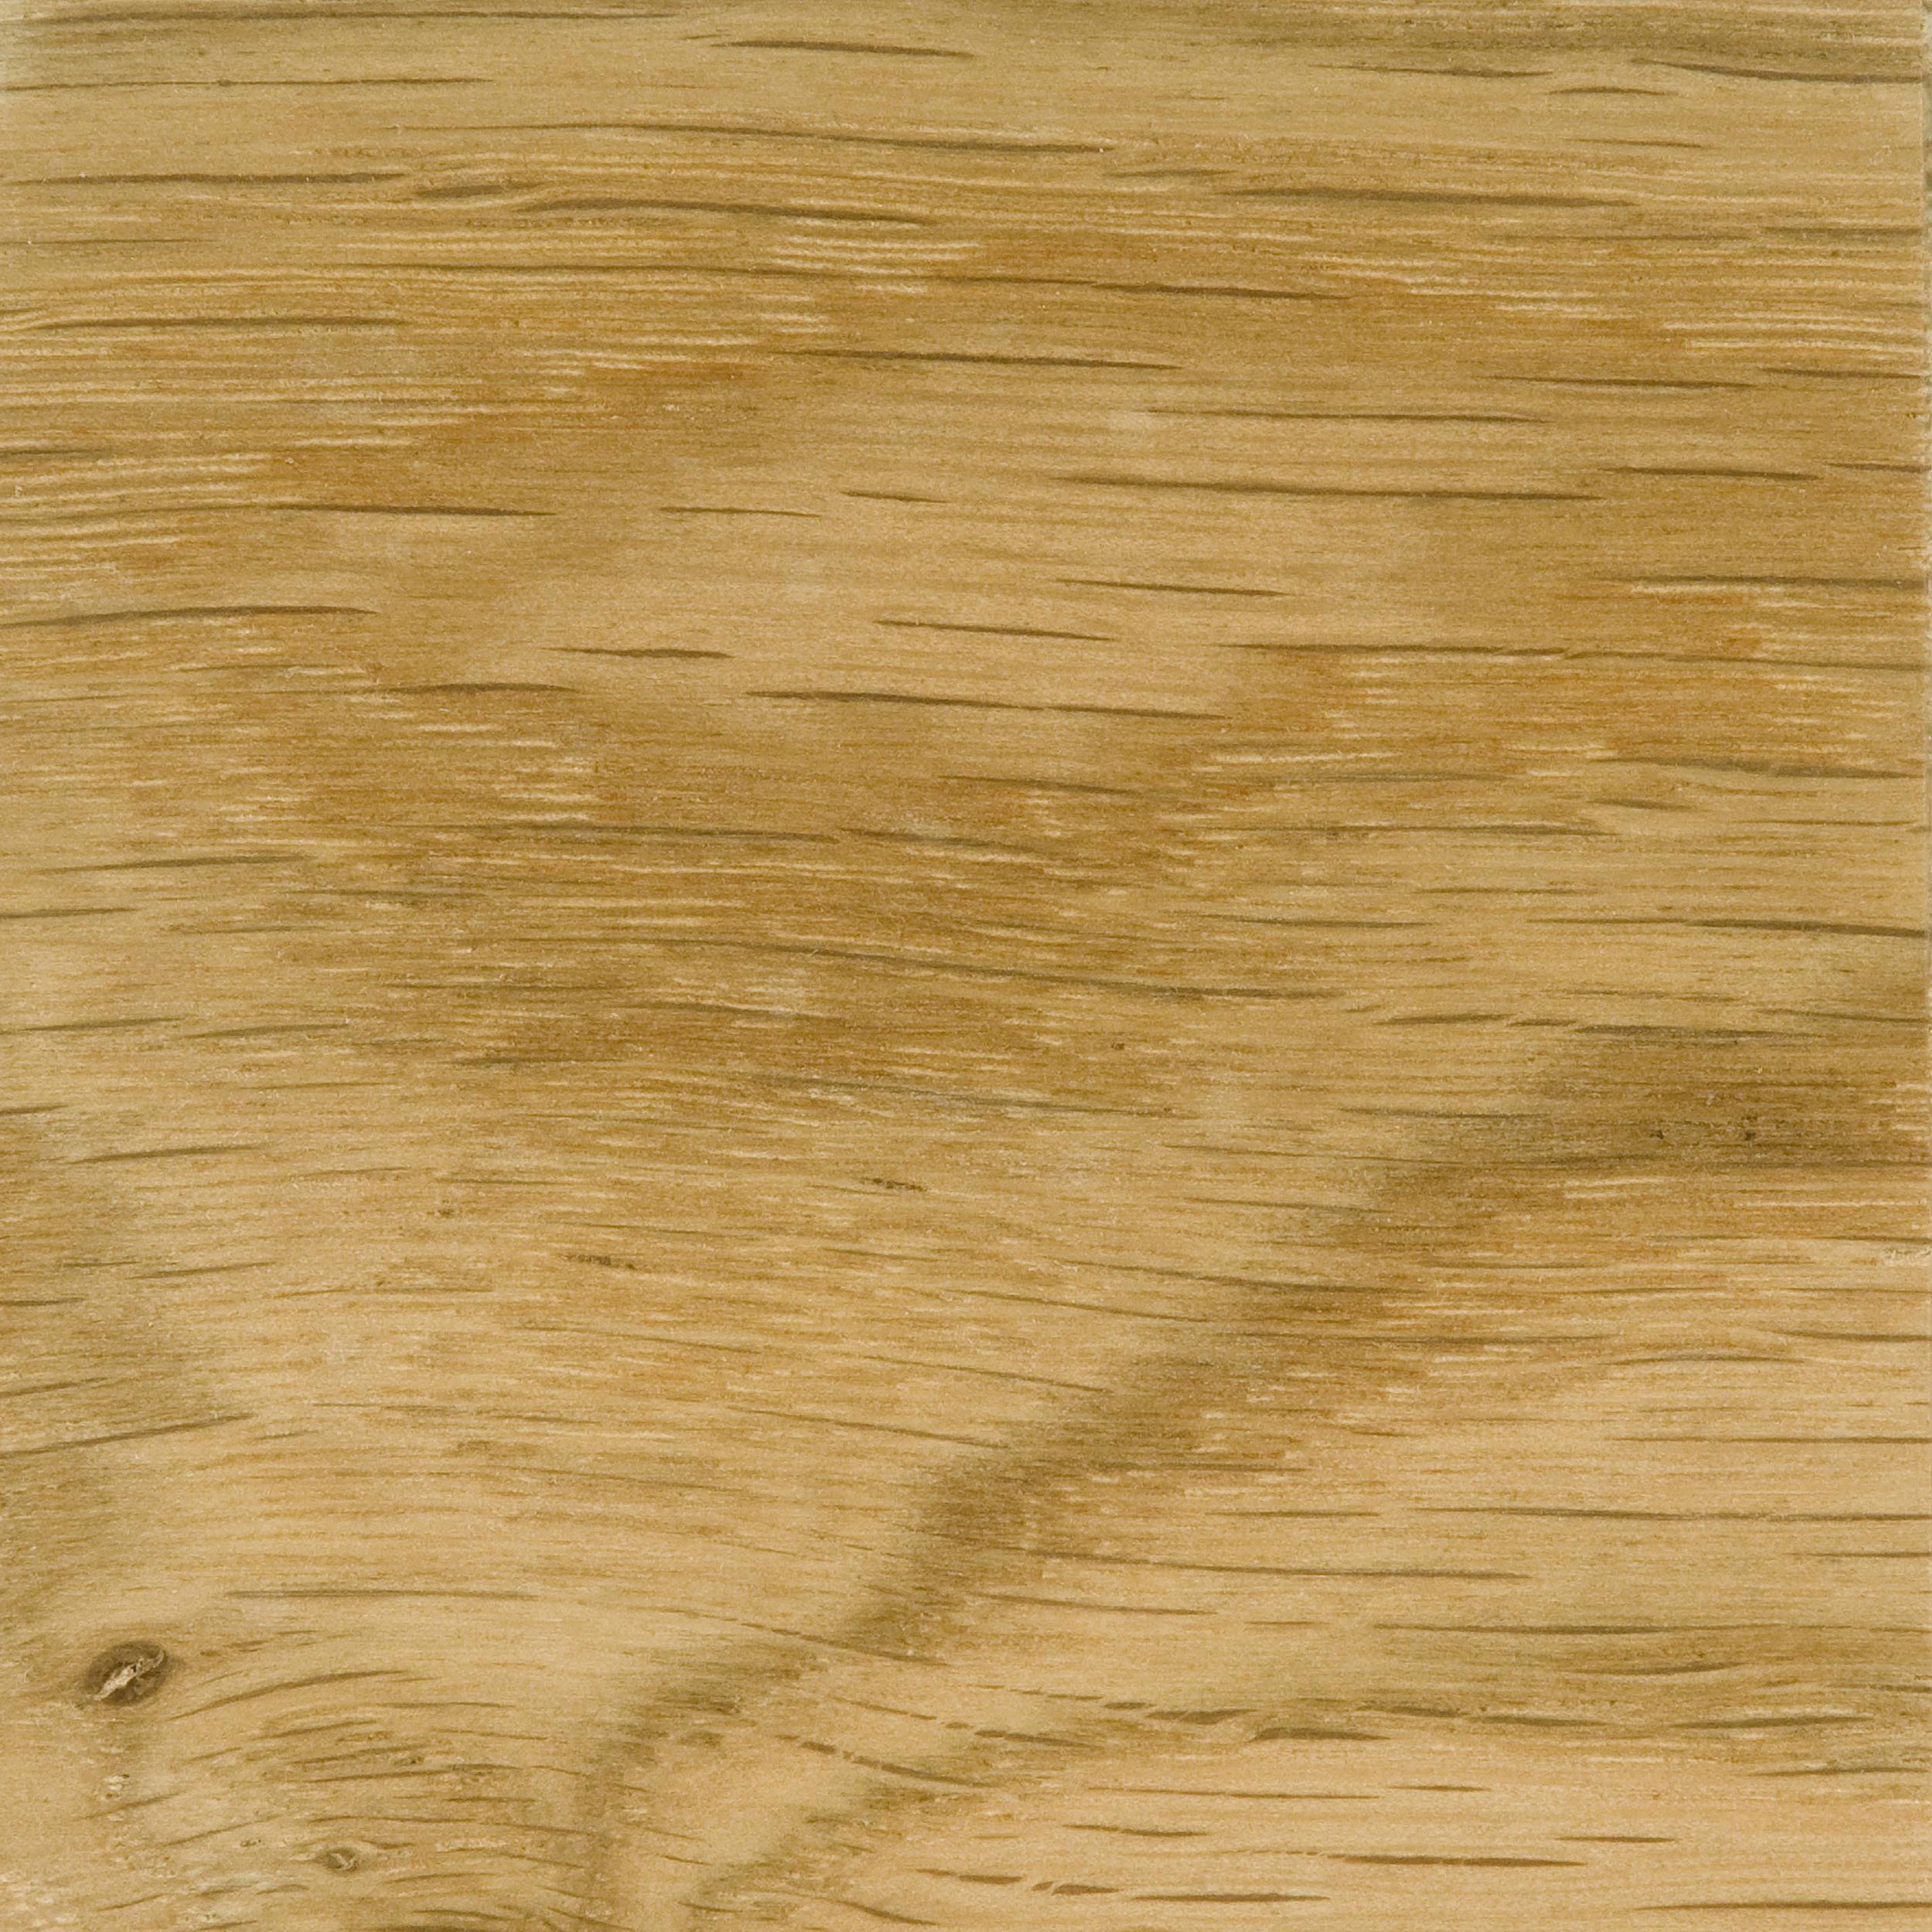 Oak Oiled